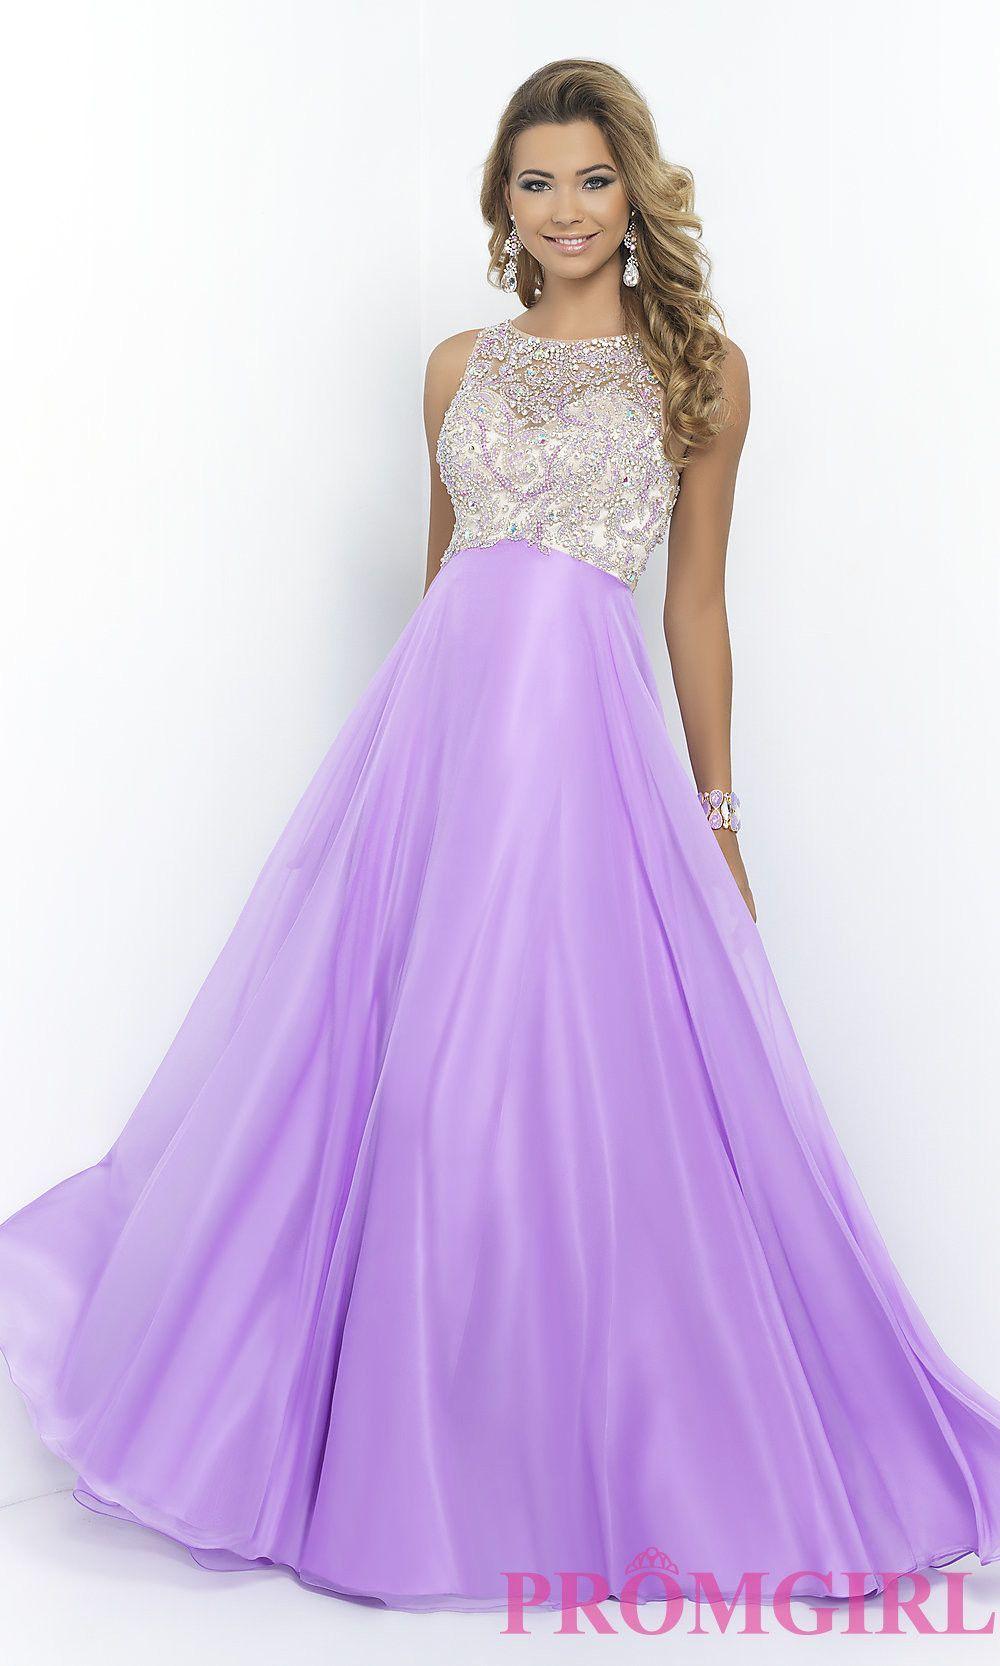 Blush Prom 9917   Prom dresses   Pinterest   Cumpleaños de 15 ...